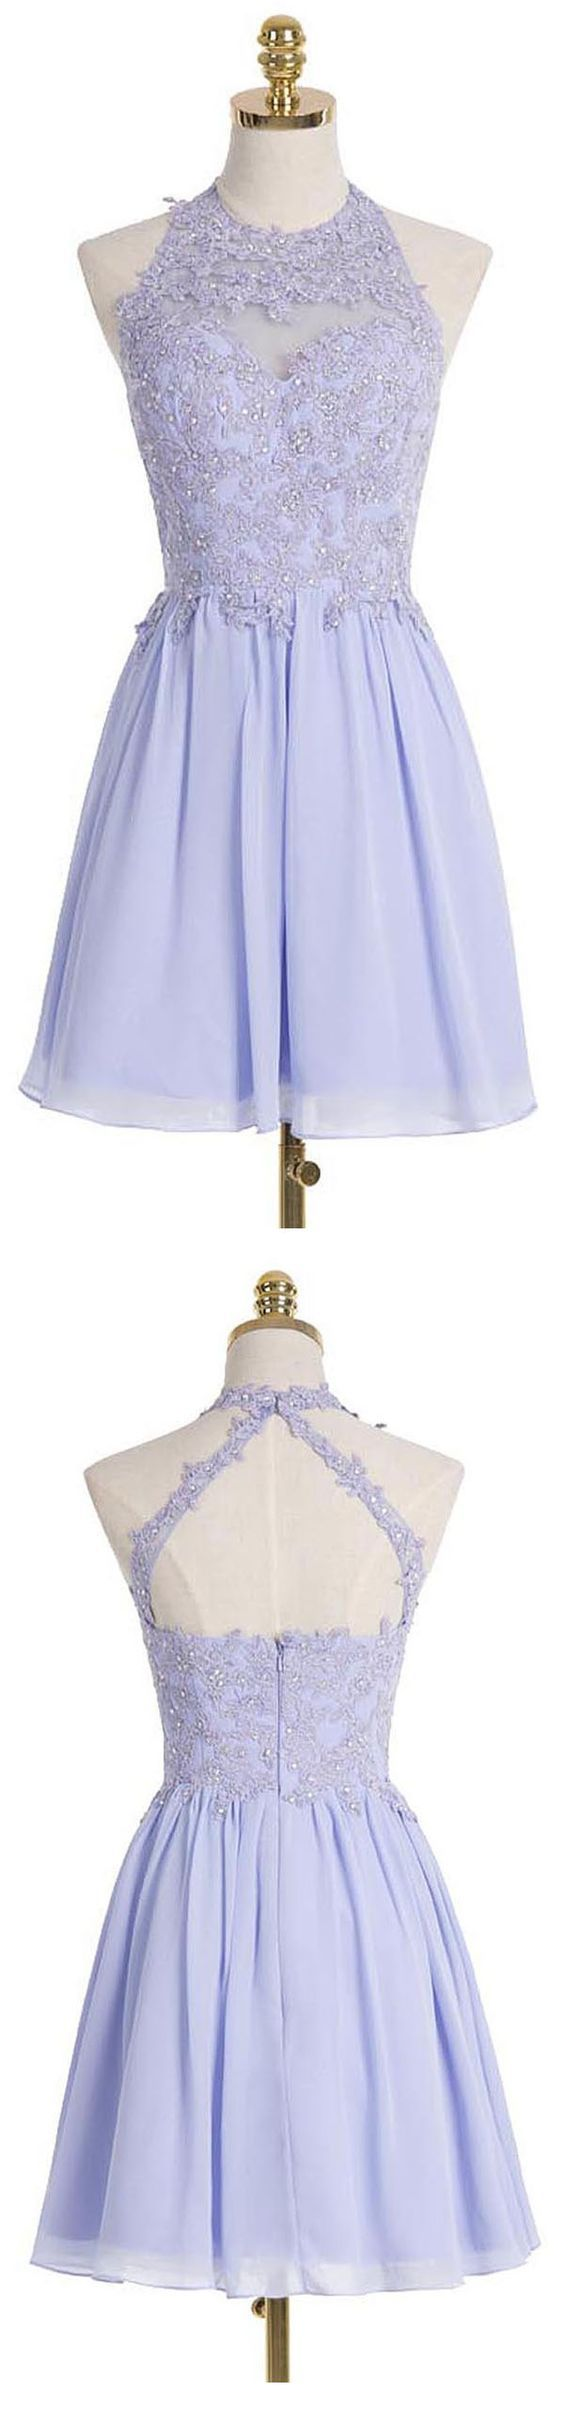 Charming Prom Dress,Chiffon Prom Dresses,Short Homecoming Dress,Sexy Party Dress